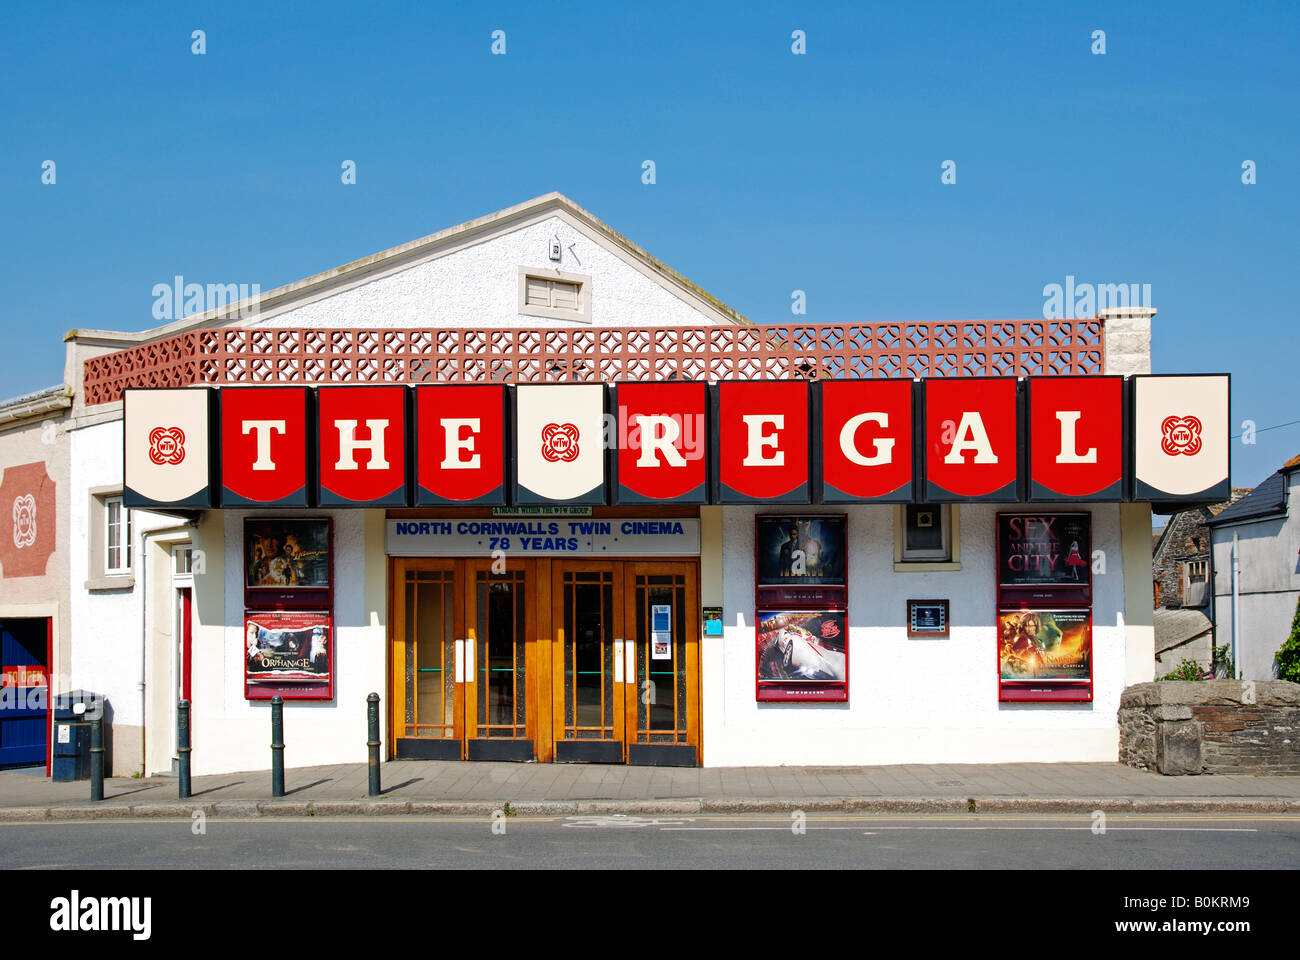 das alte königliche Kino in Wadebridge in Cornwall, england Stockbild